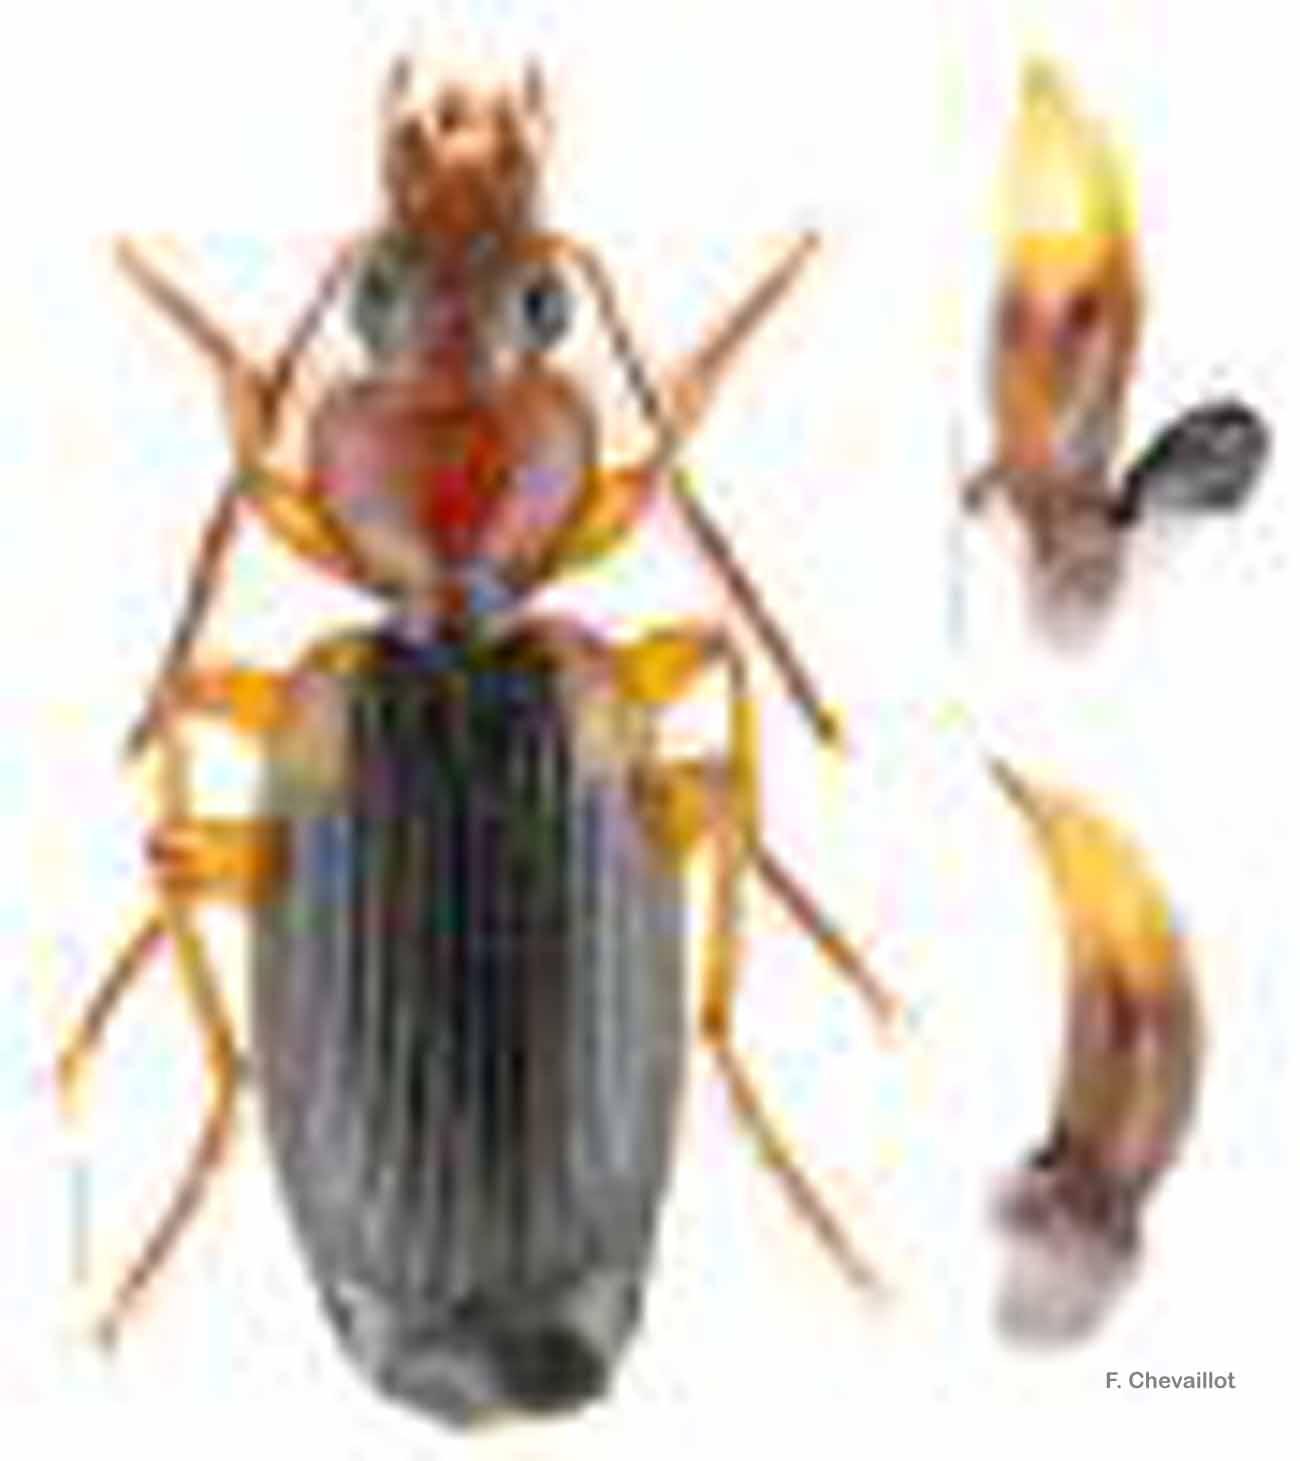 Cymindis scapularis